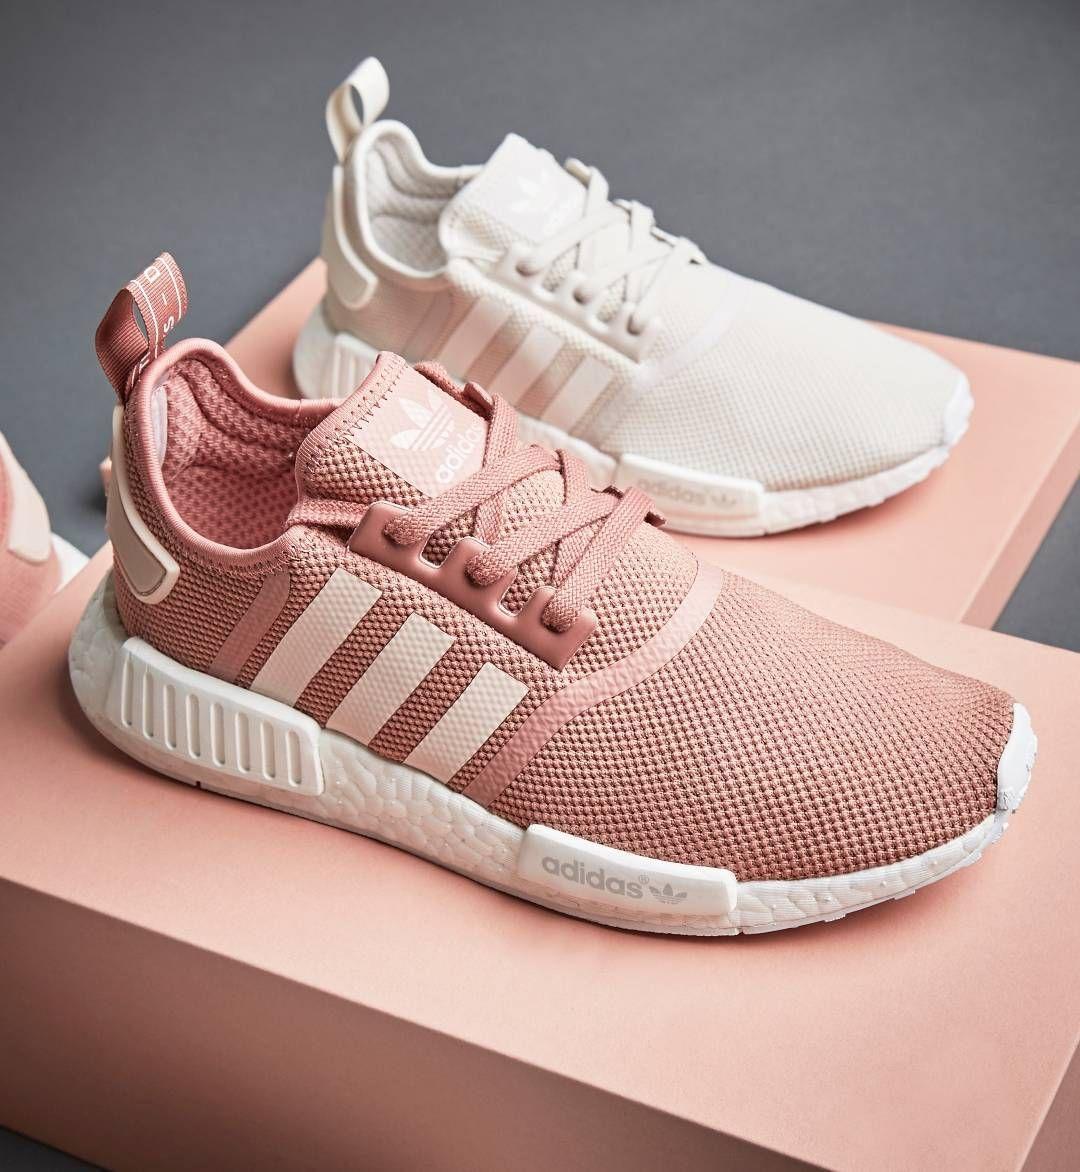 yeezy$21 on | Adidas superstar, Adidas shoes women, Adidas